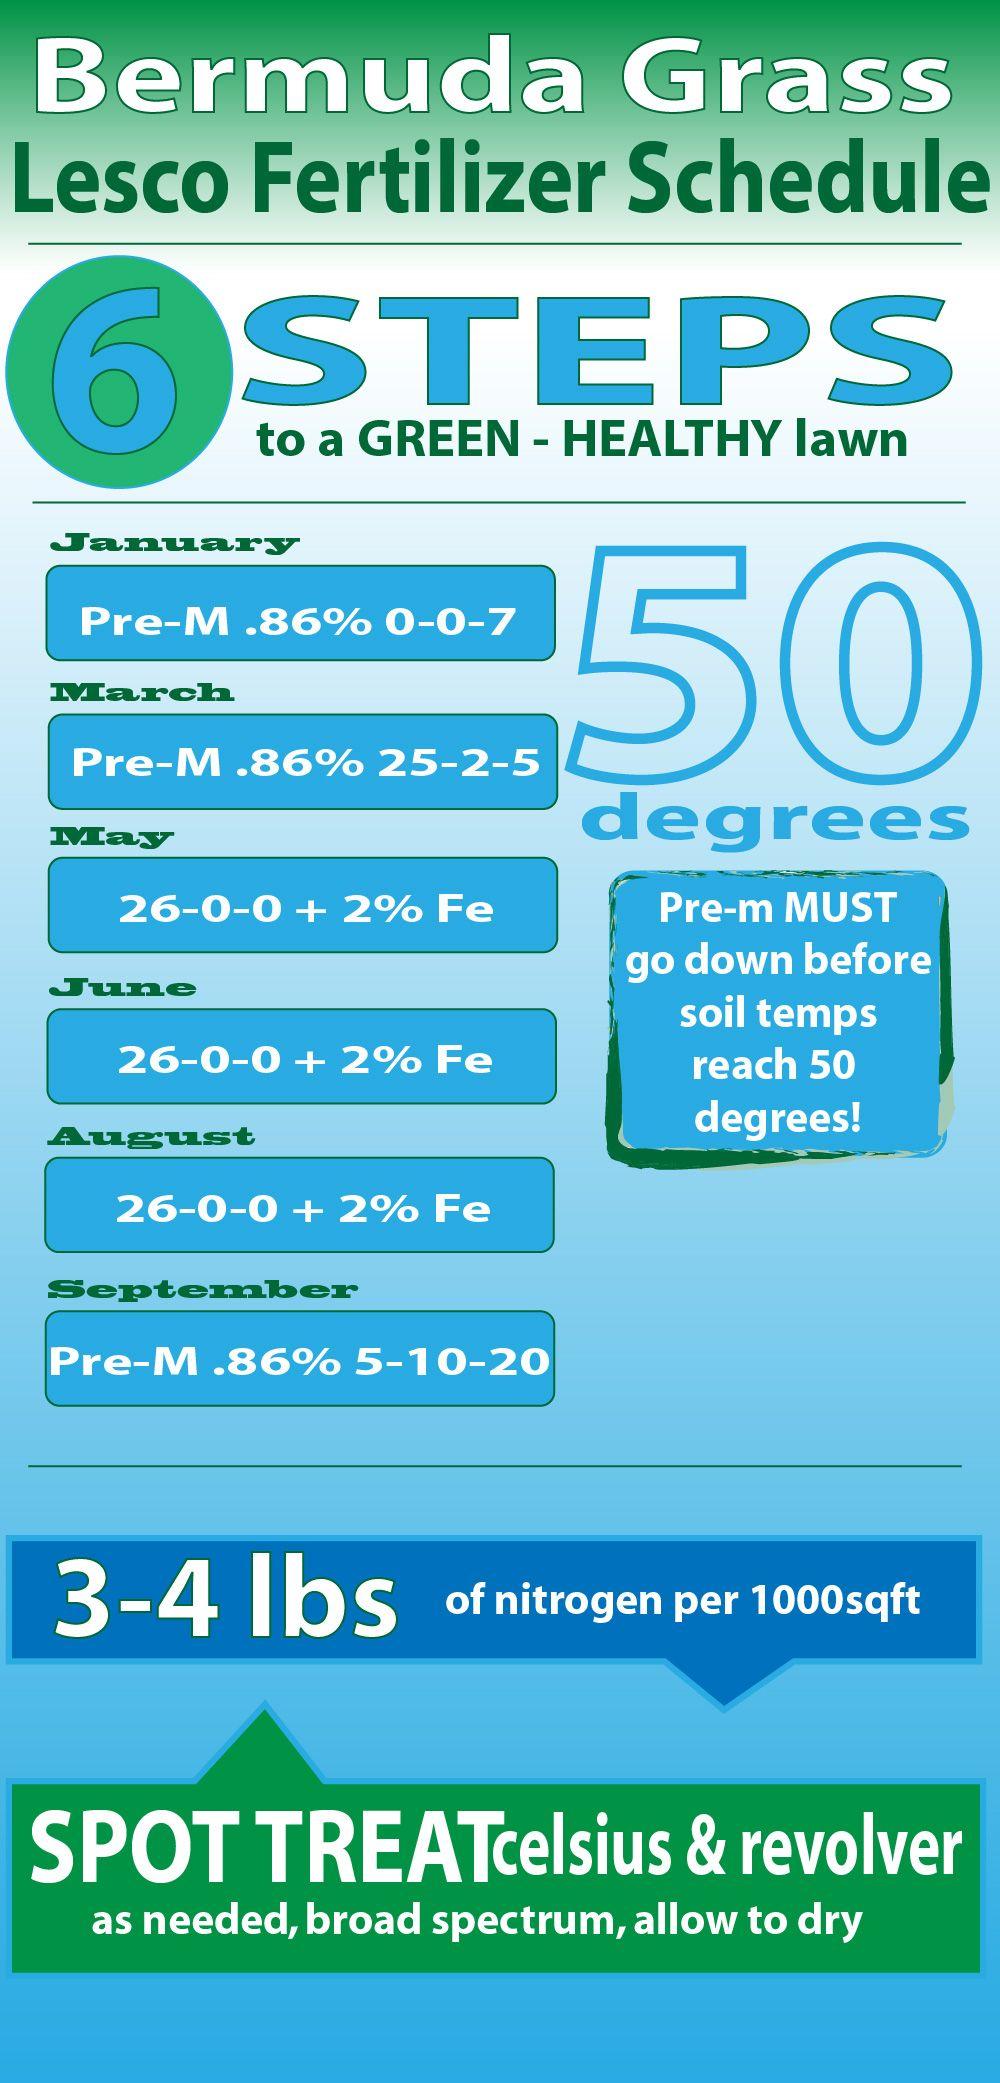 lesco fertilizer schedule | Outdoors | Pinterest | Bermudas and ...